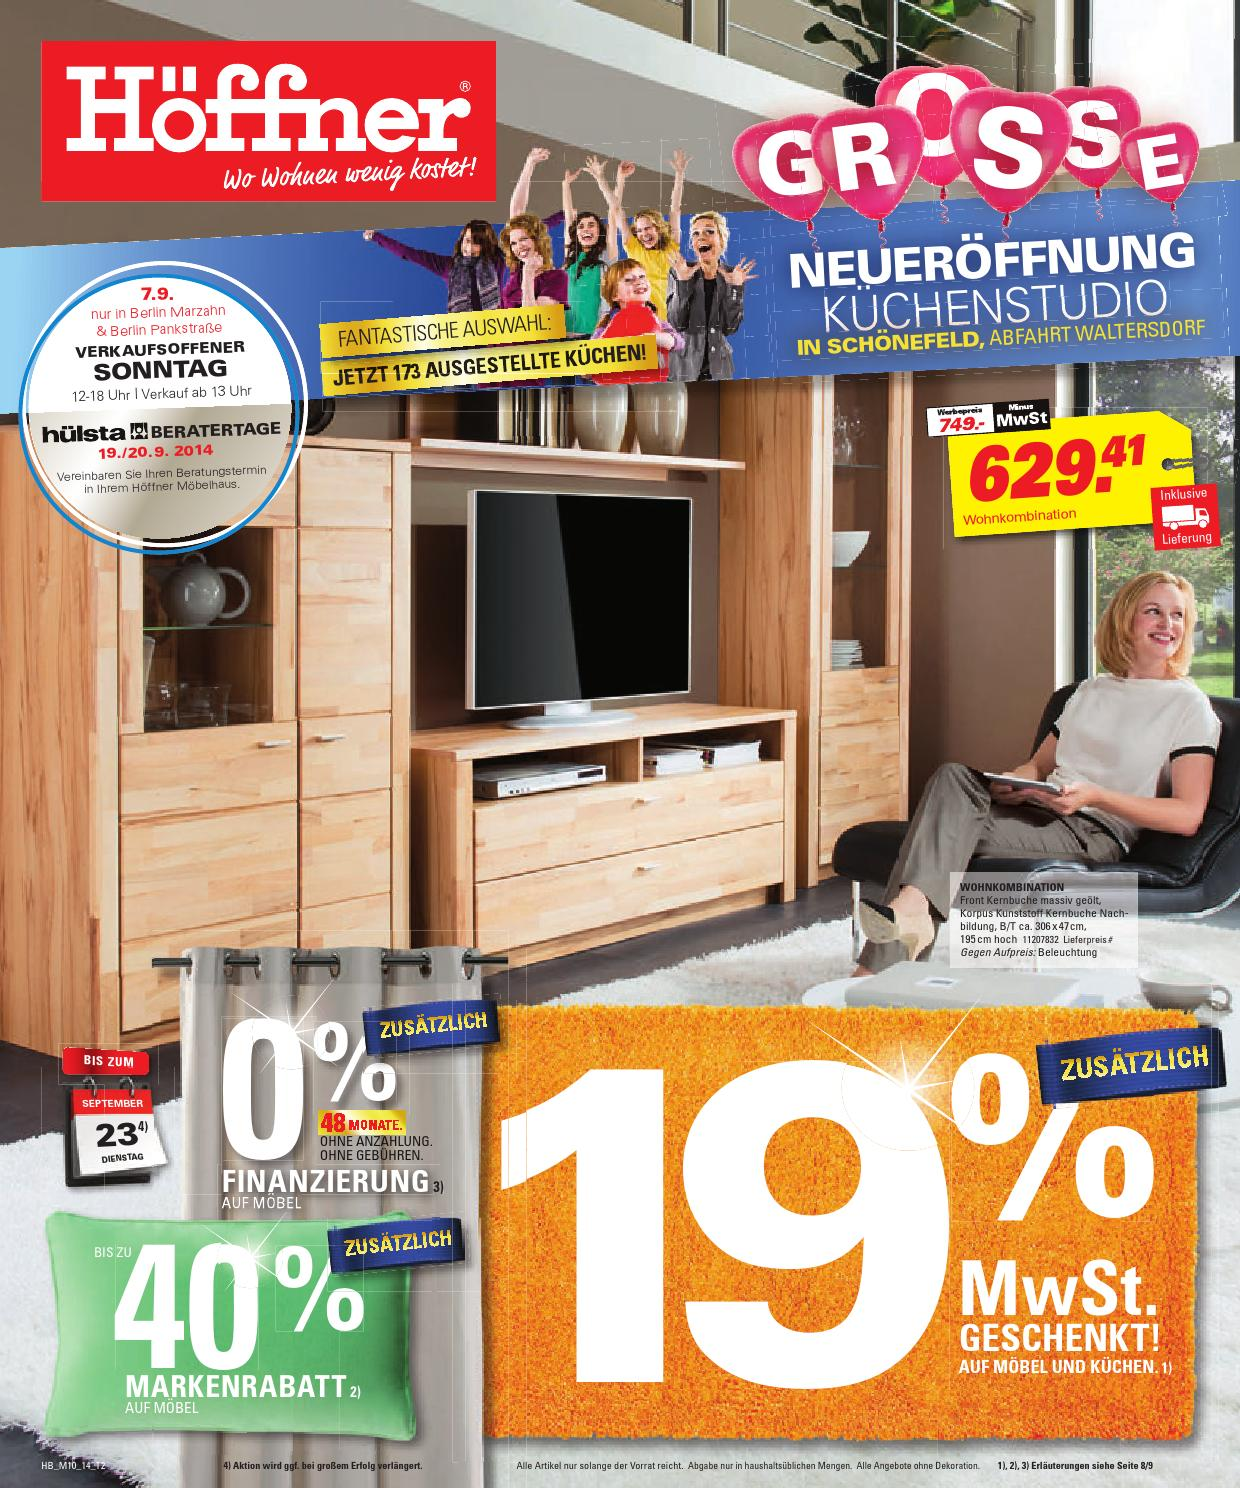 issuu h ffner gro e neuer ffnung by berlin medien gmbh. Black Bedroom Furniture Sets. Home Design Ideas